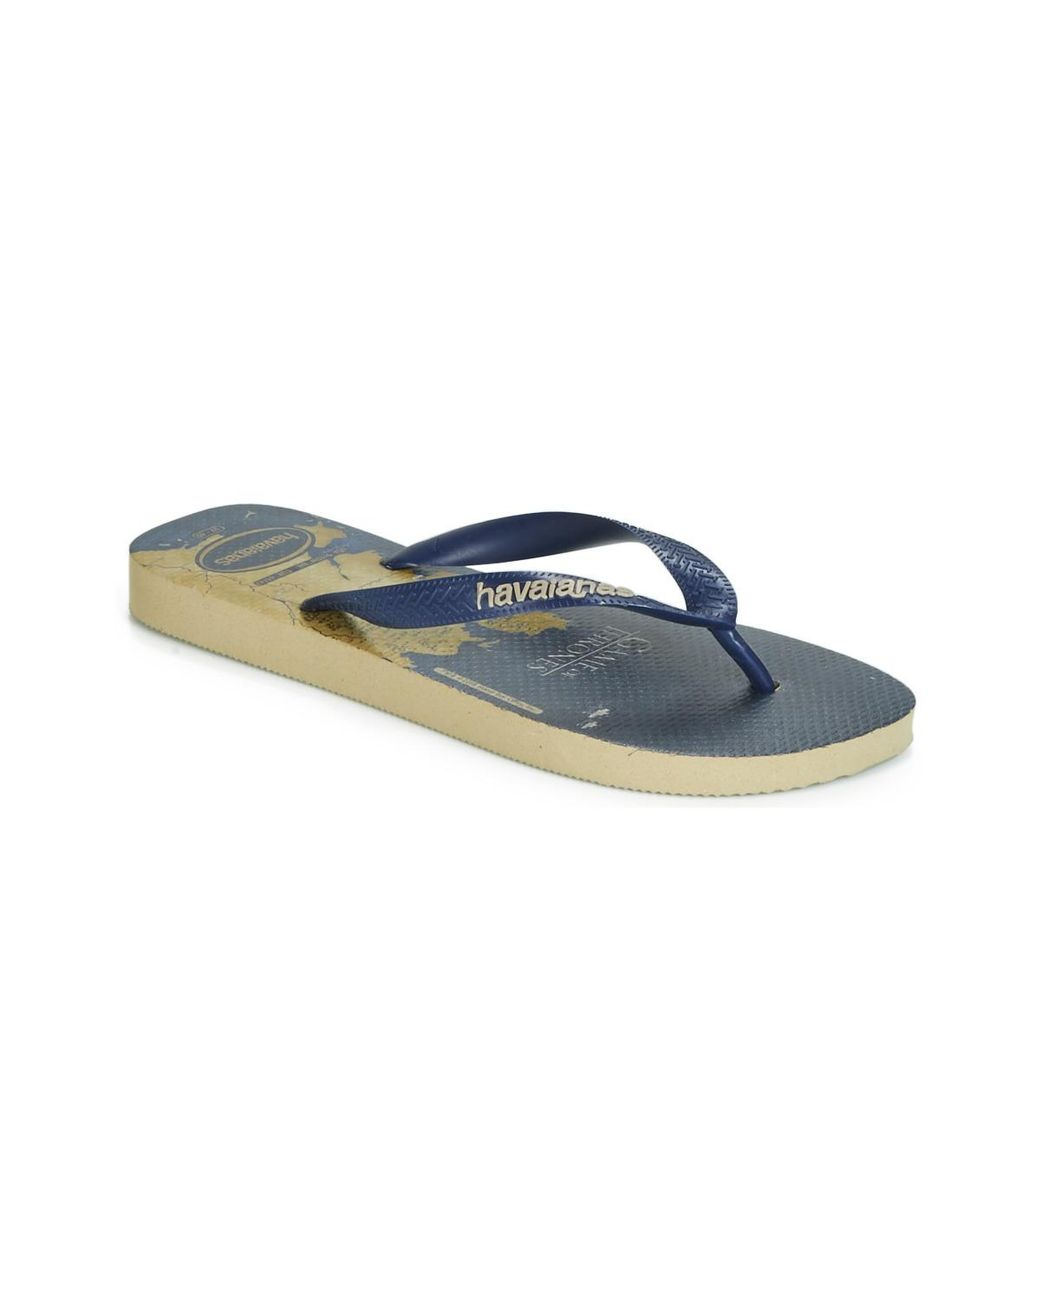 29803f502 Havaianas Top Got Flip Flops   Sandals (shoes) in Blue for Men - Lyst